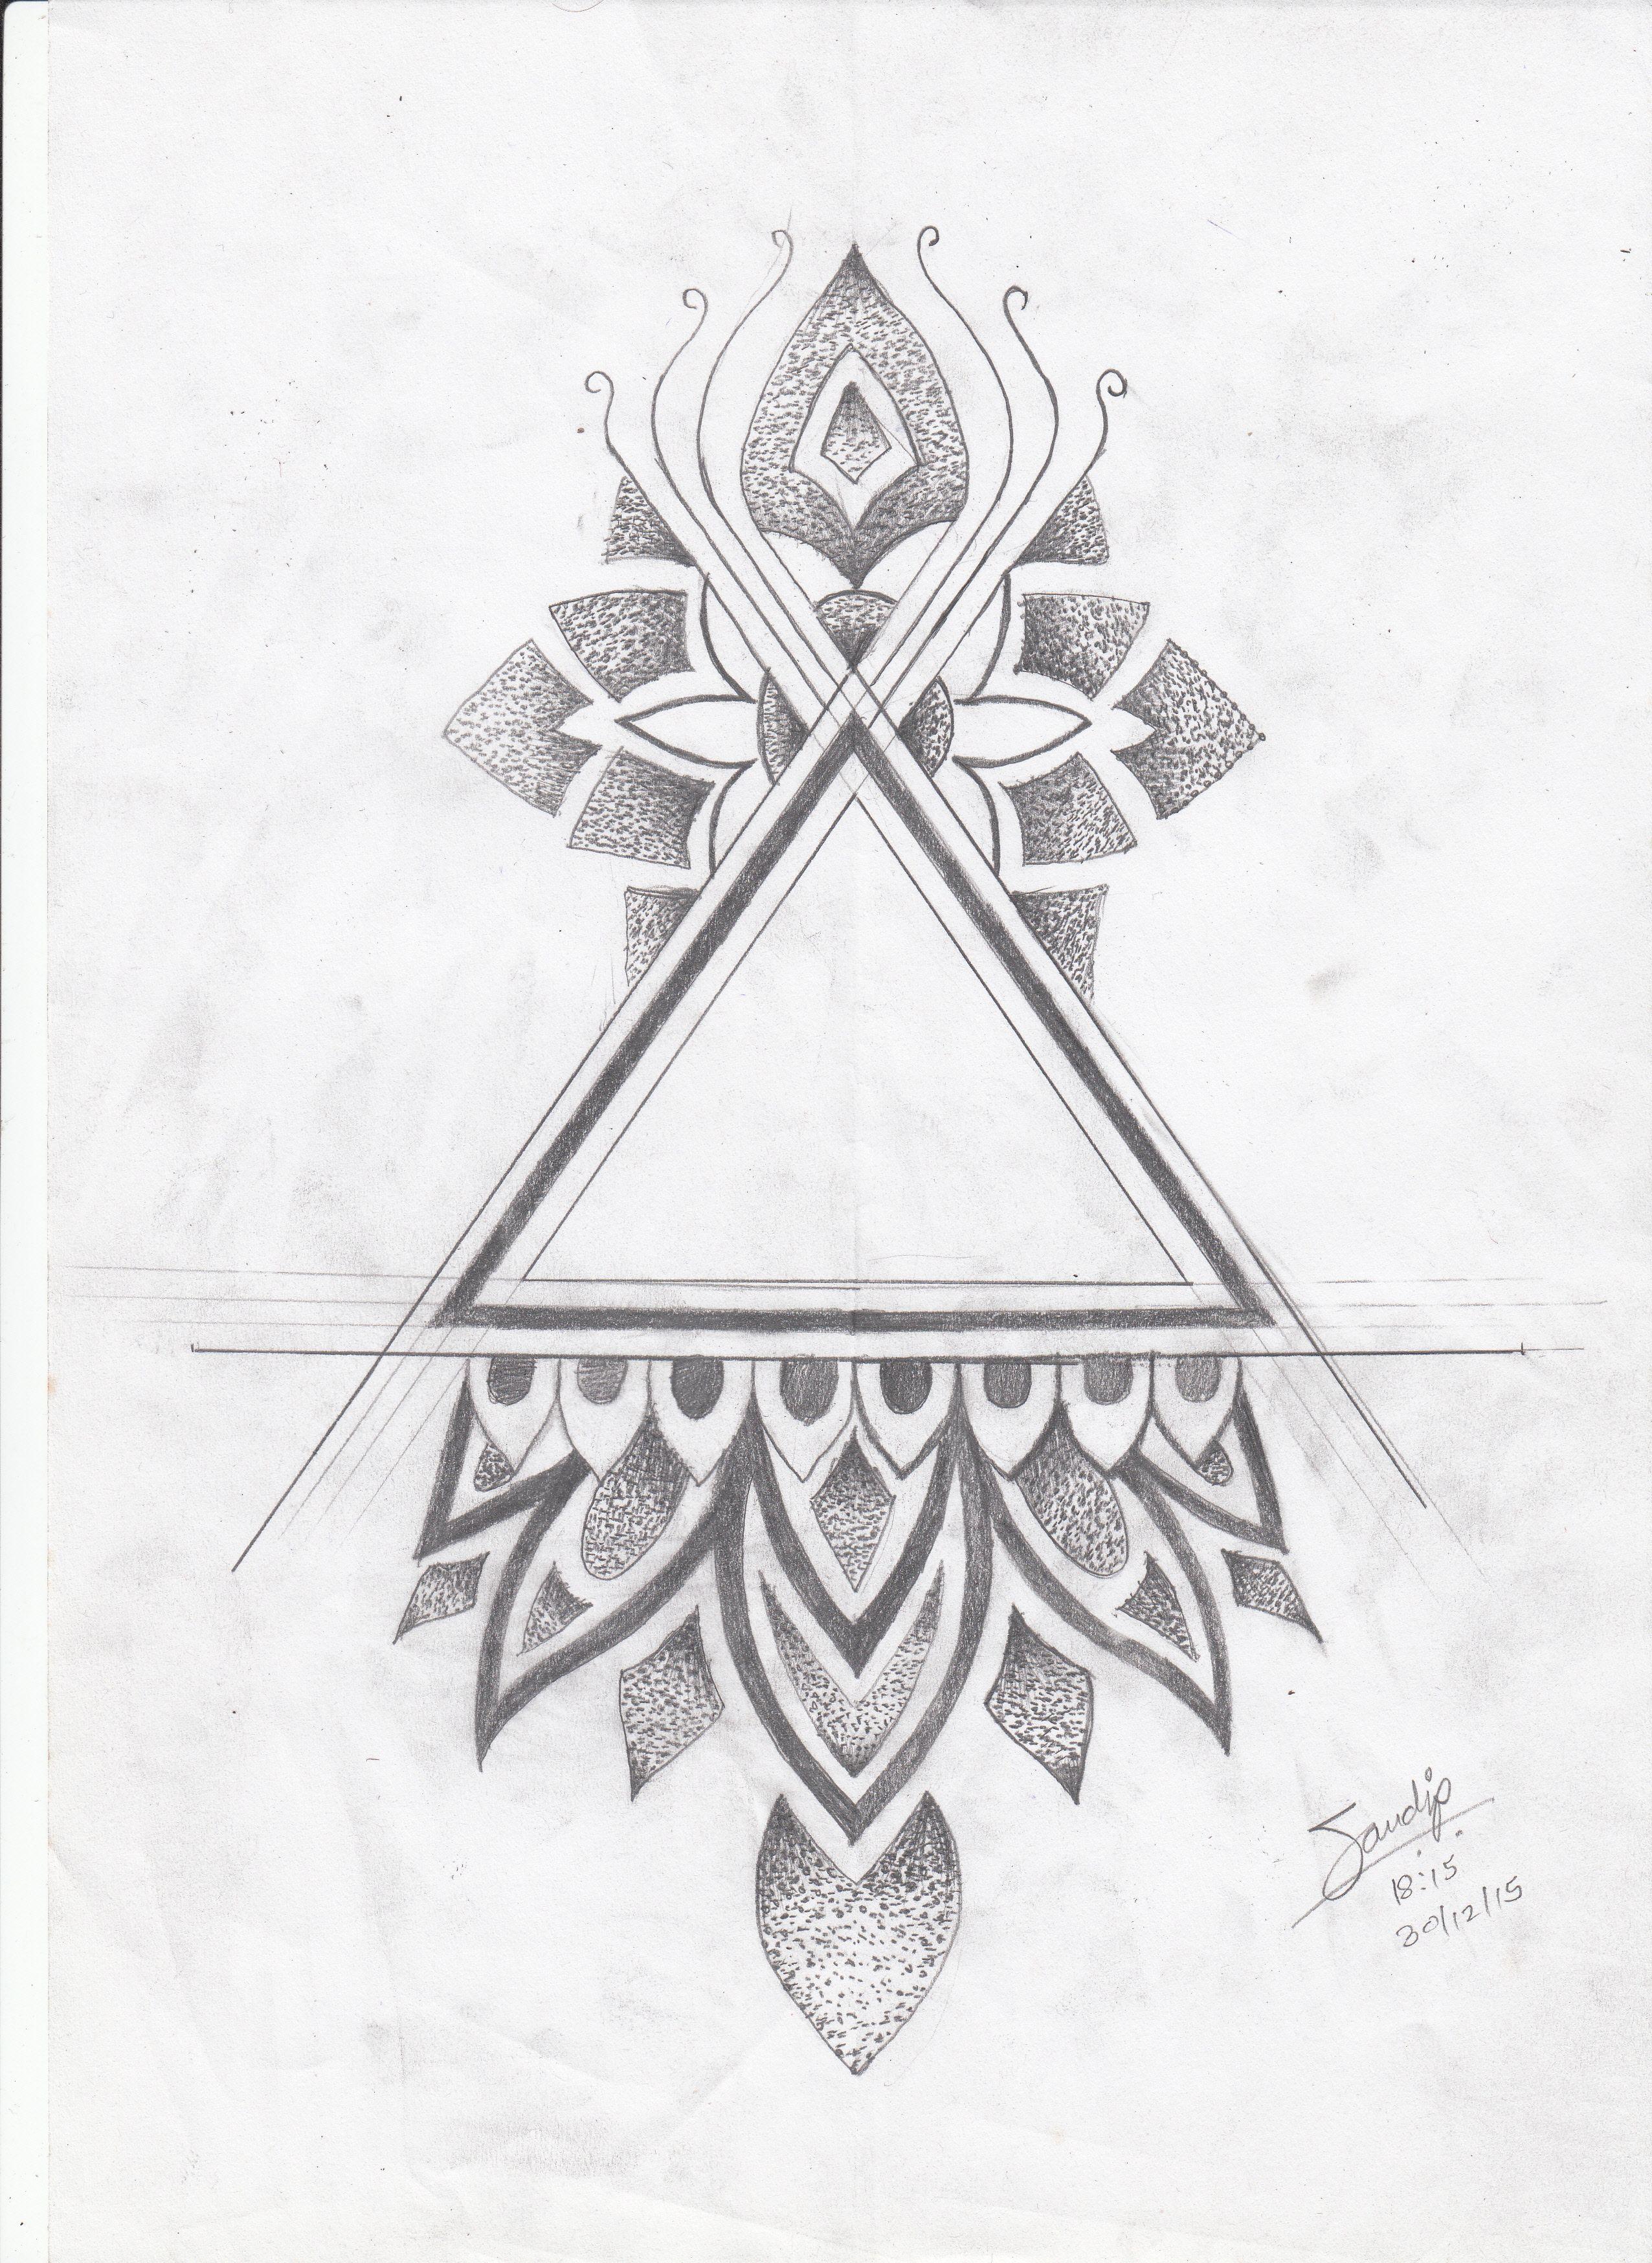 Triangle Tattoo Design By Artist Sandip Bold Tattoo Studio In